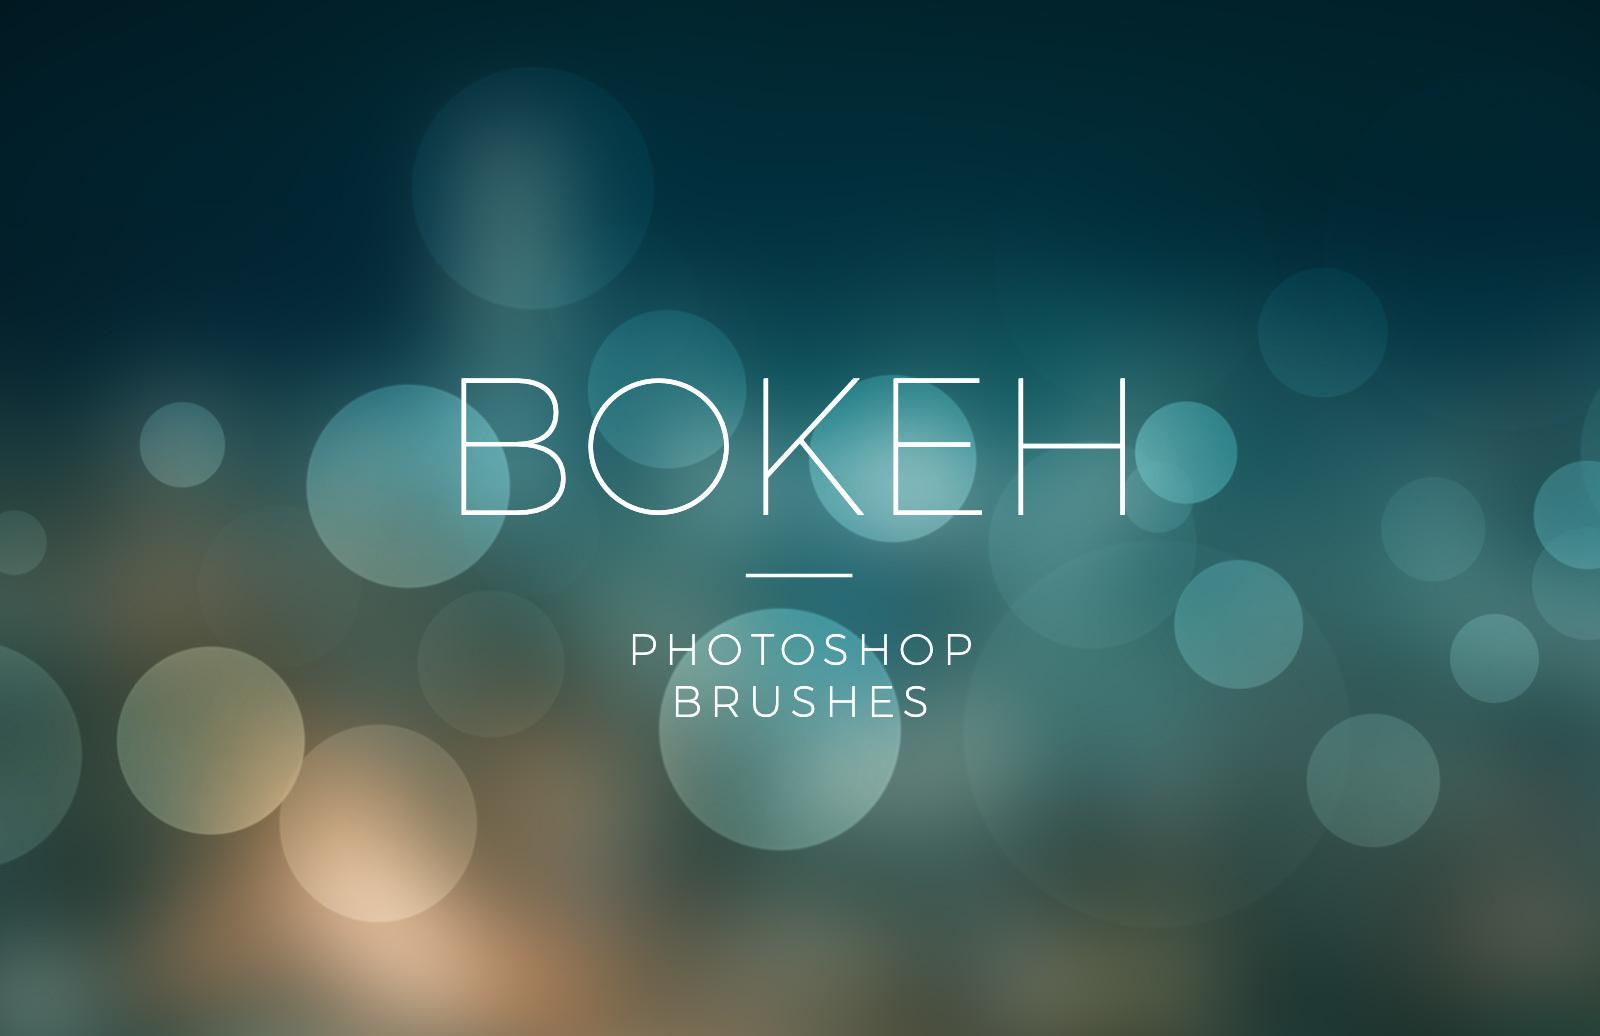 Bokeh - Free Photoshop Brushes